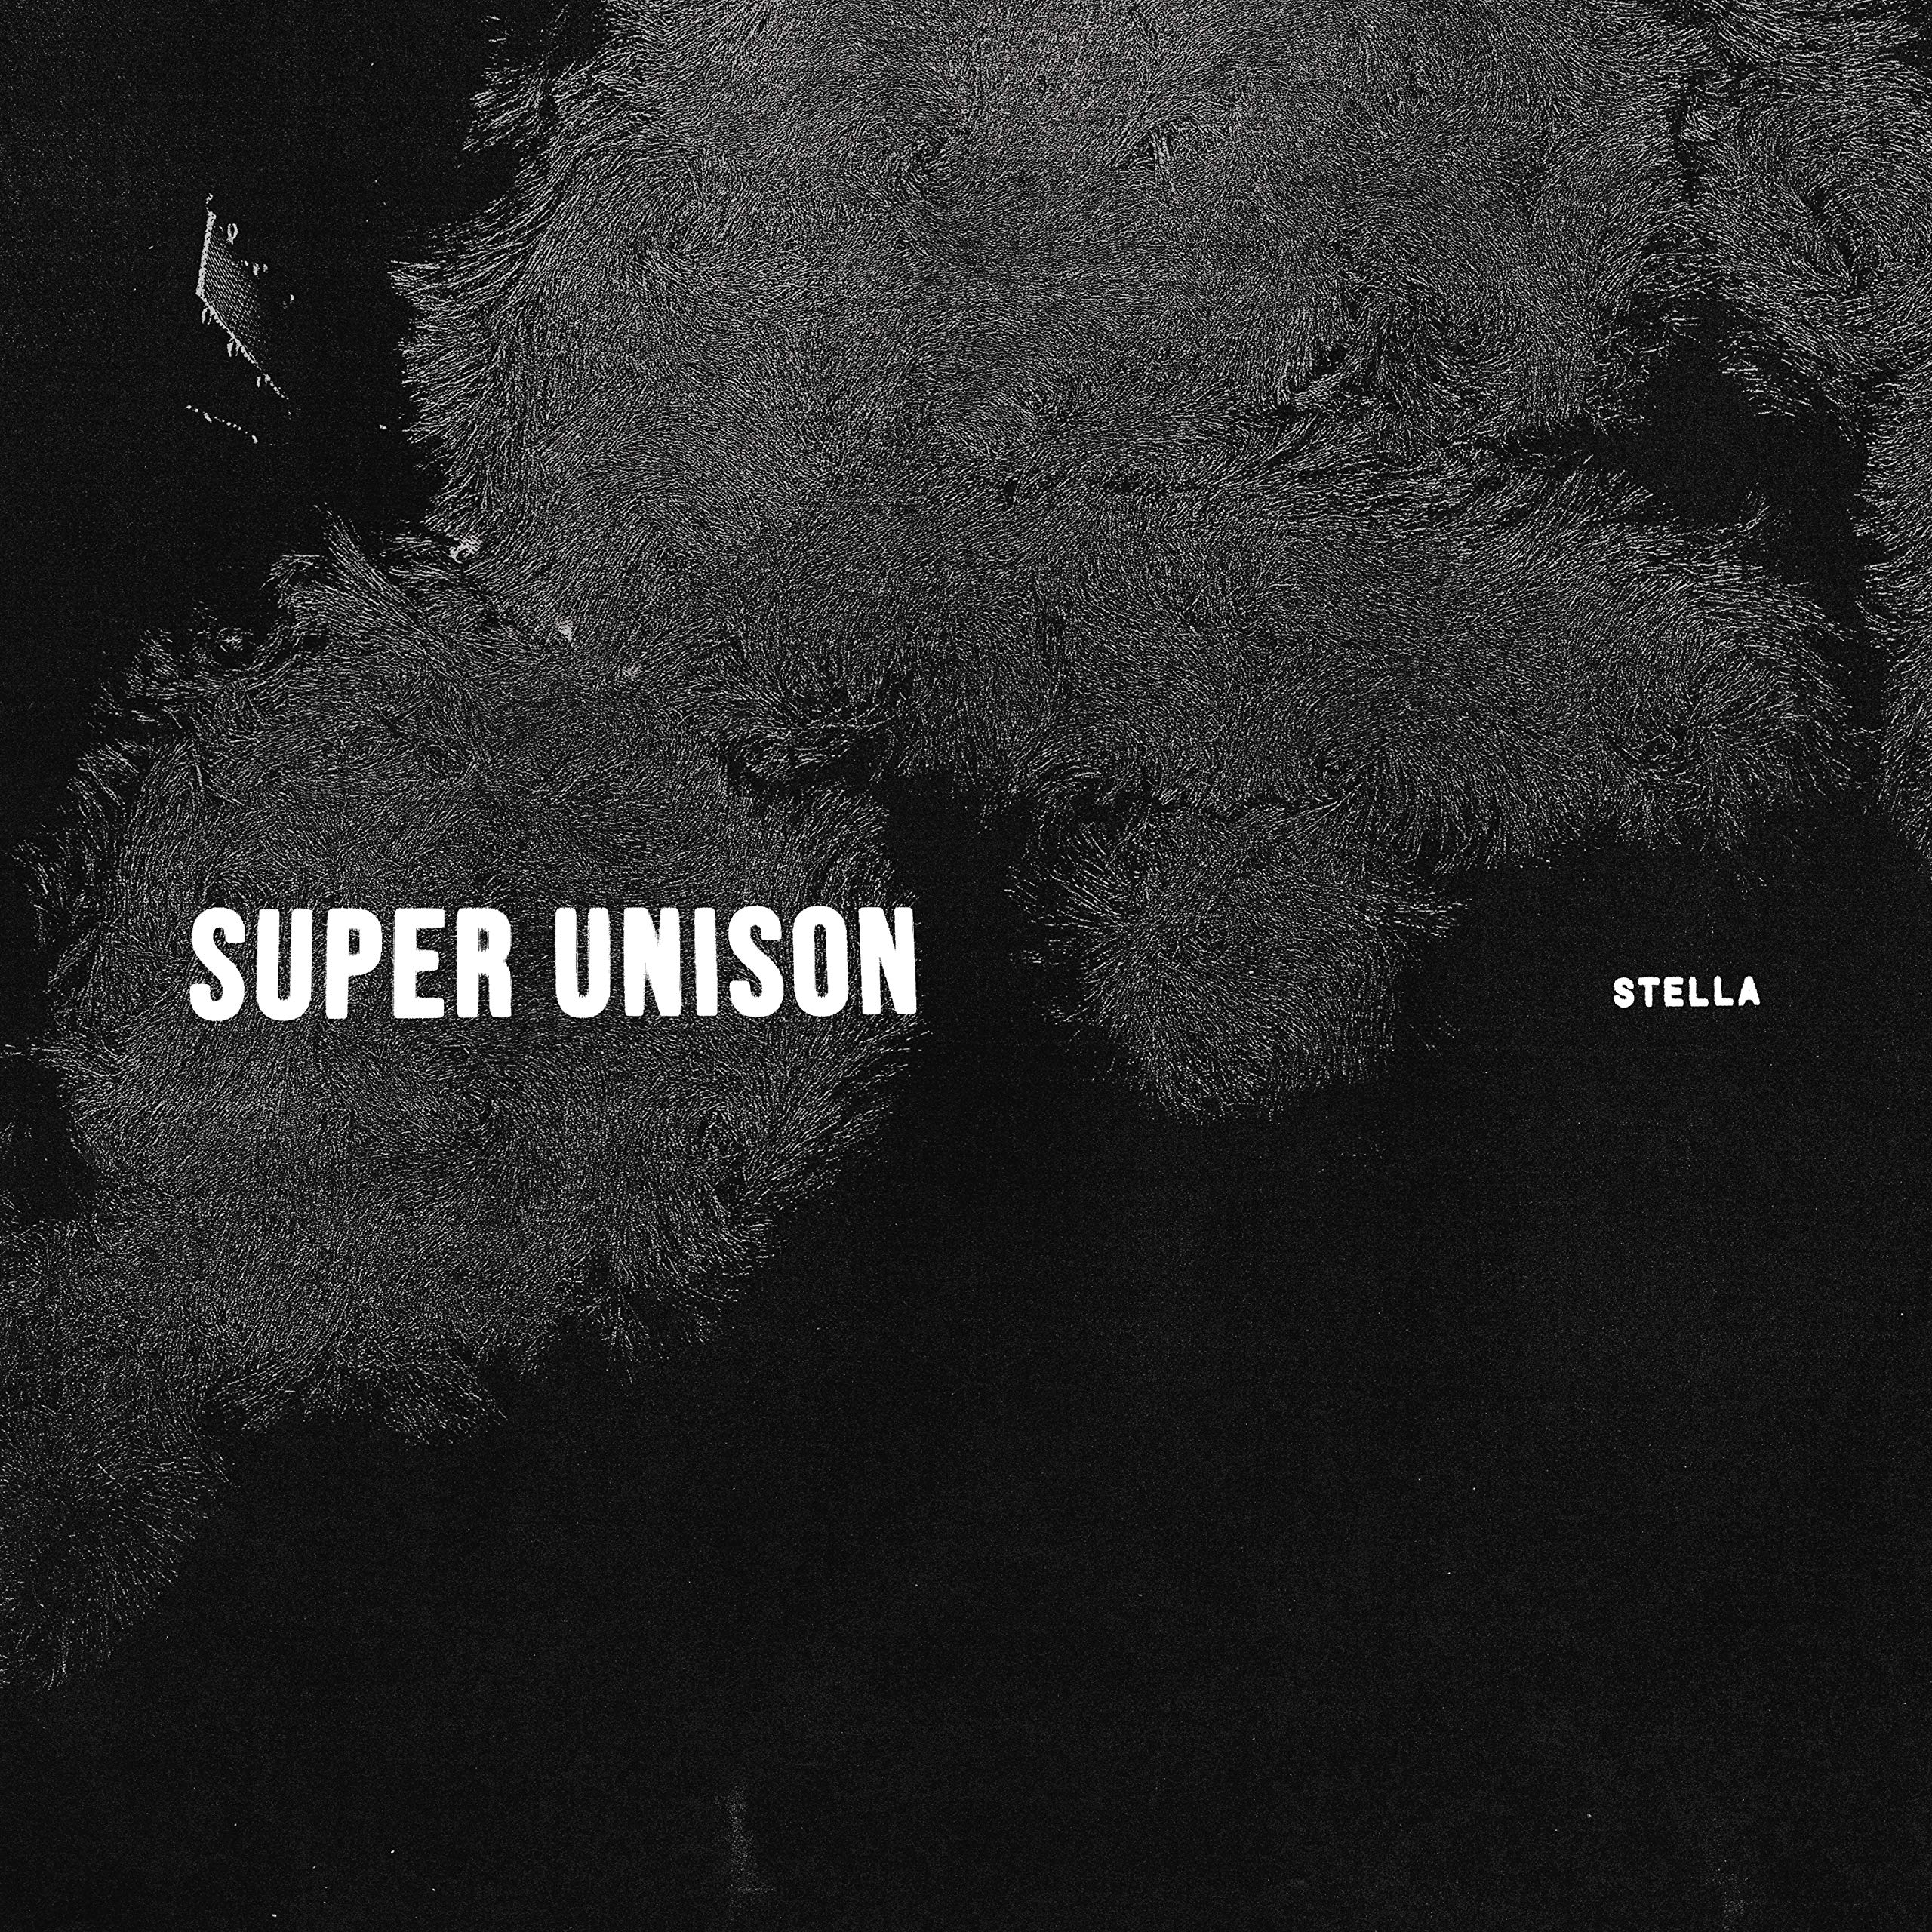 Cassette : Super Unison - Stella (Cassette)